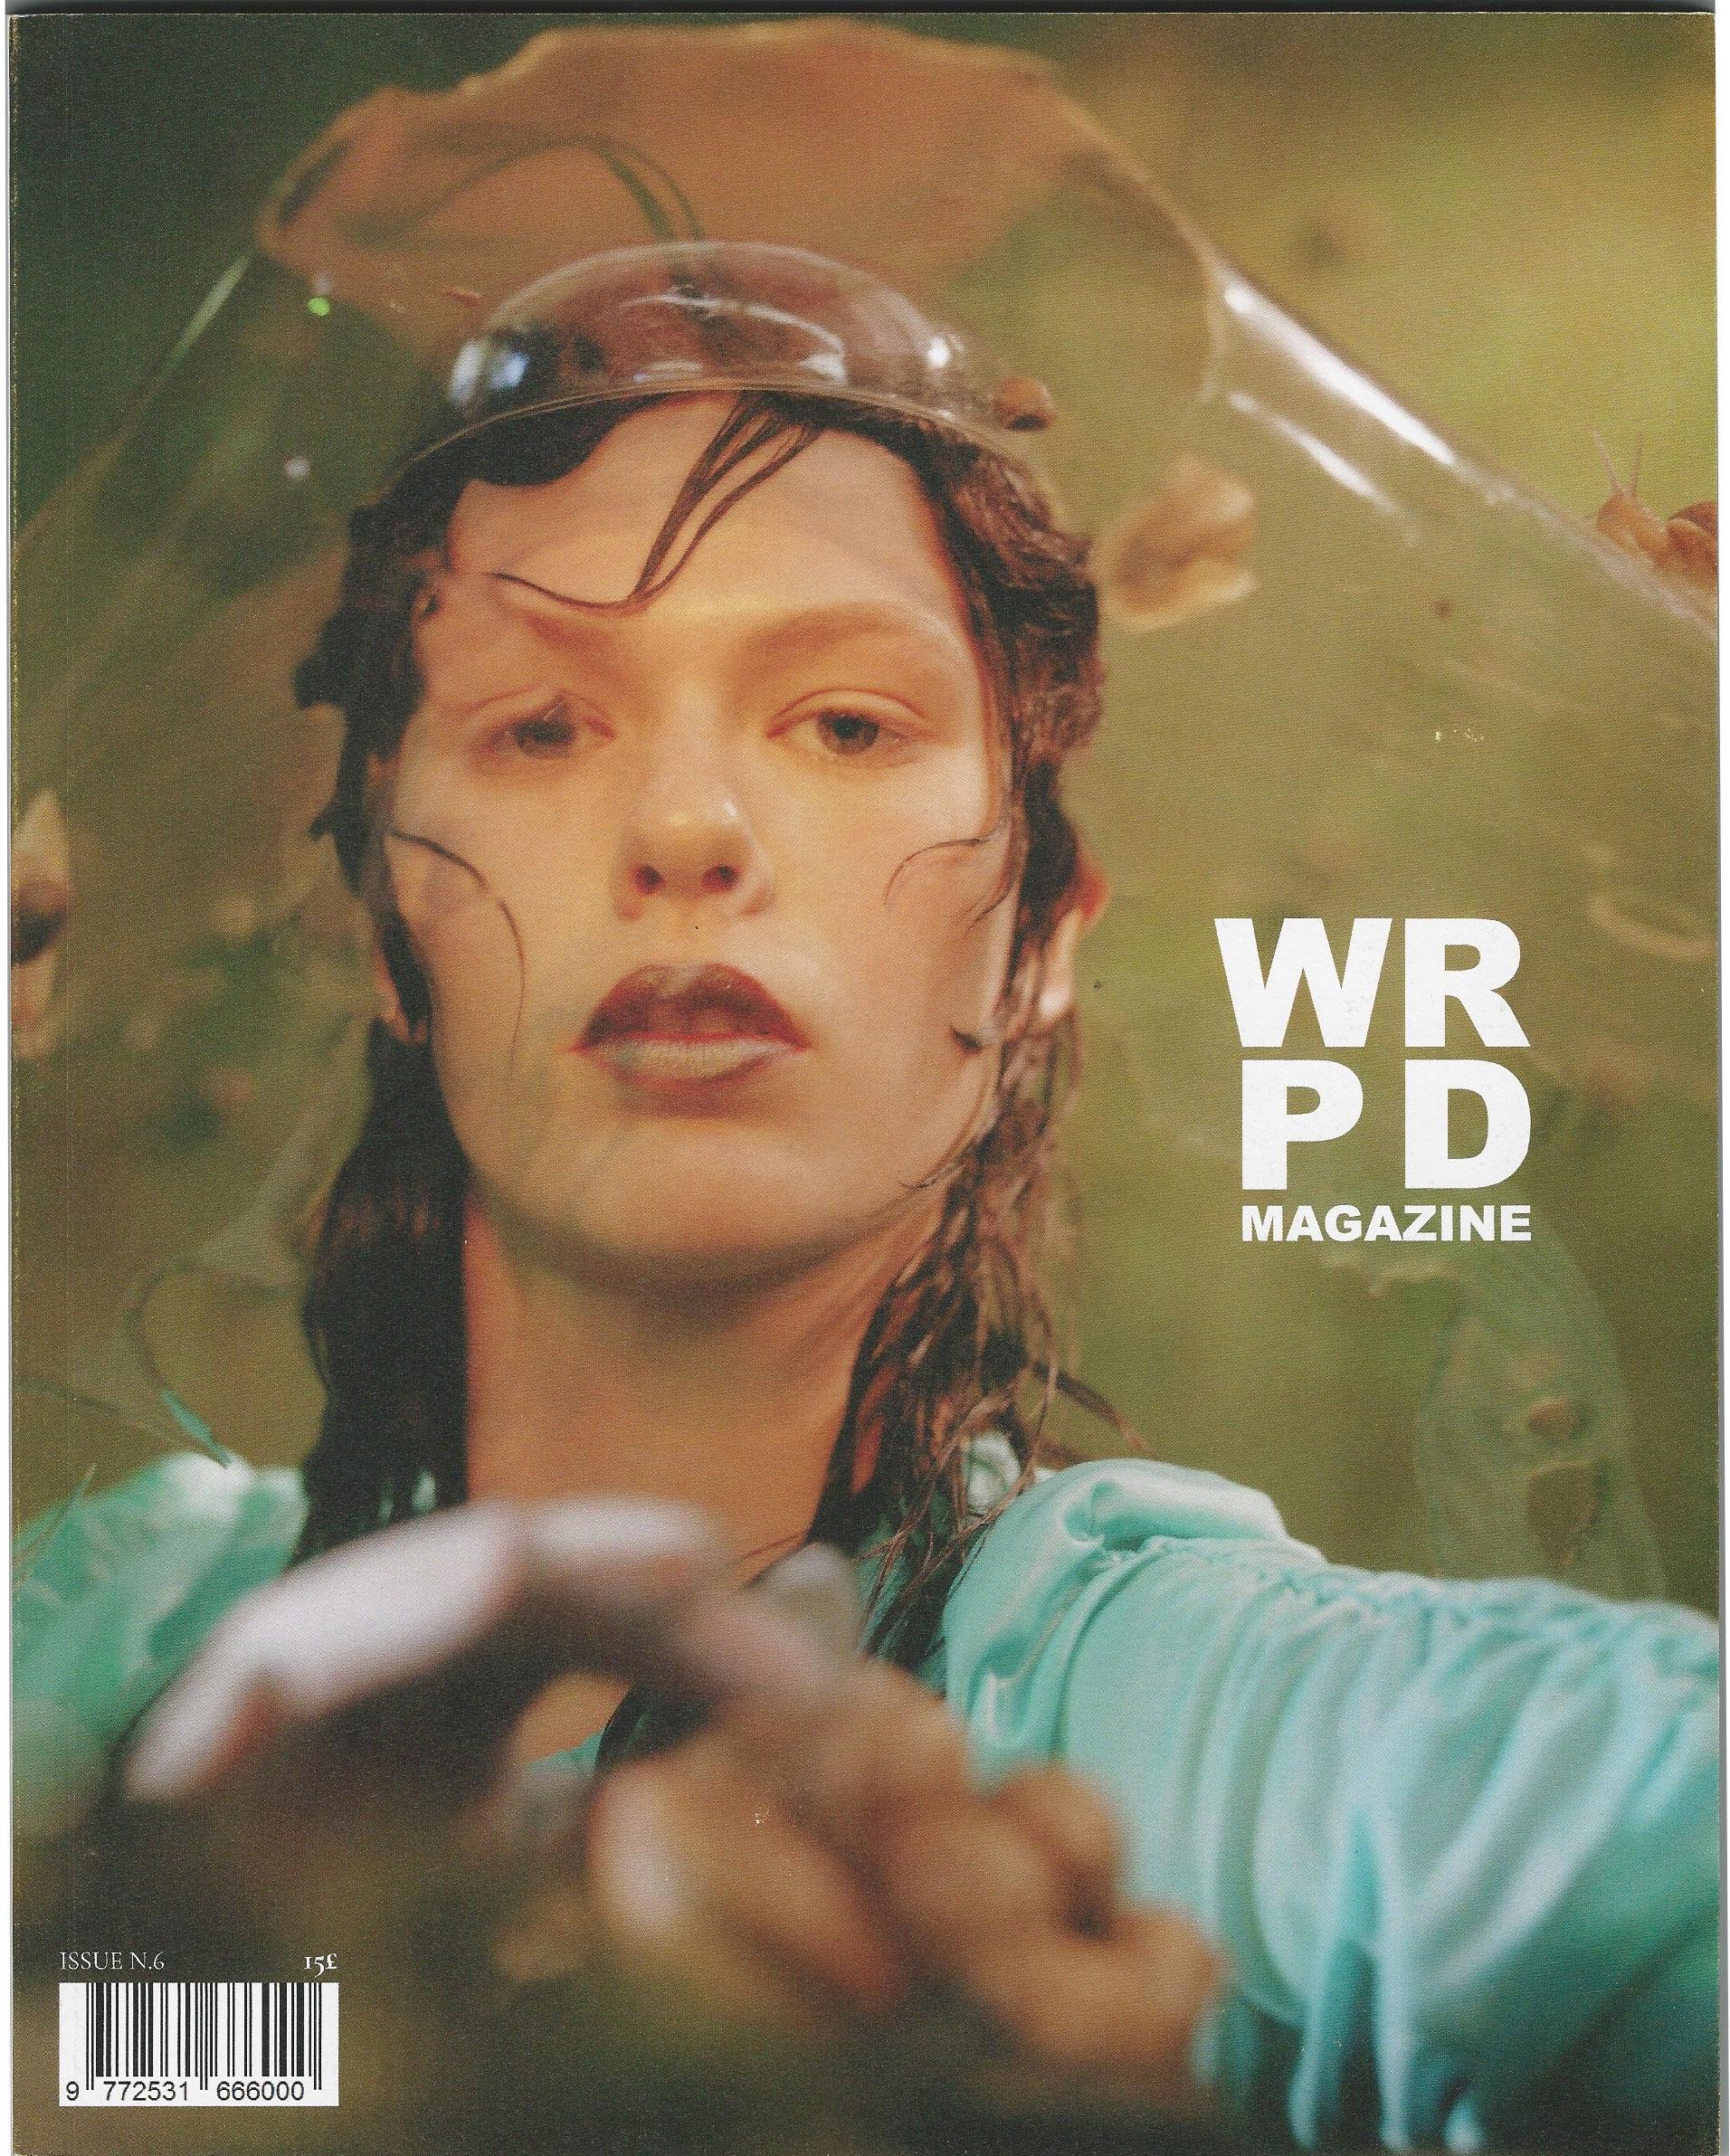 Frankie and Clo Magazine 'Sofia'   Photographer: Sara Mattone - Stylist: Aureliano Quattrone - Make up: Ginevra Calie